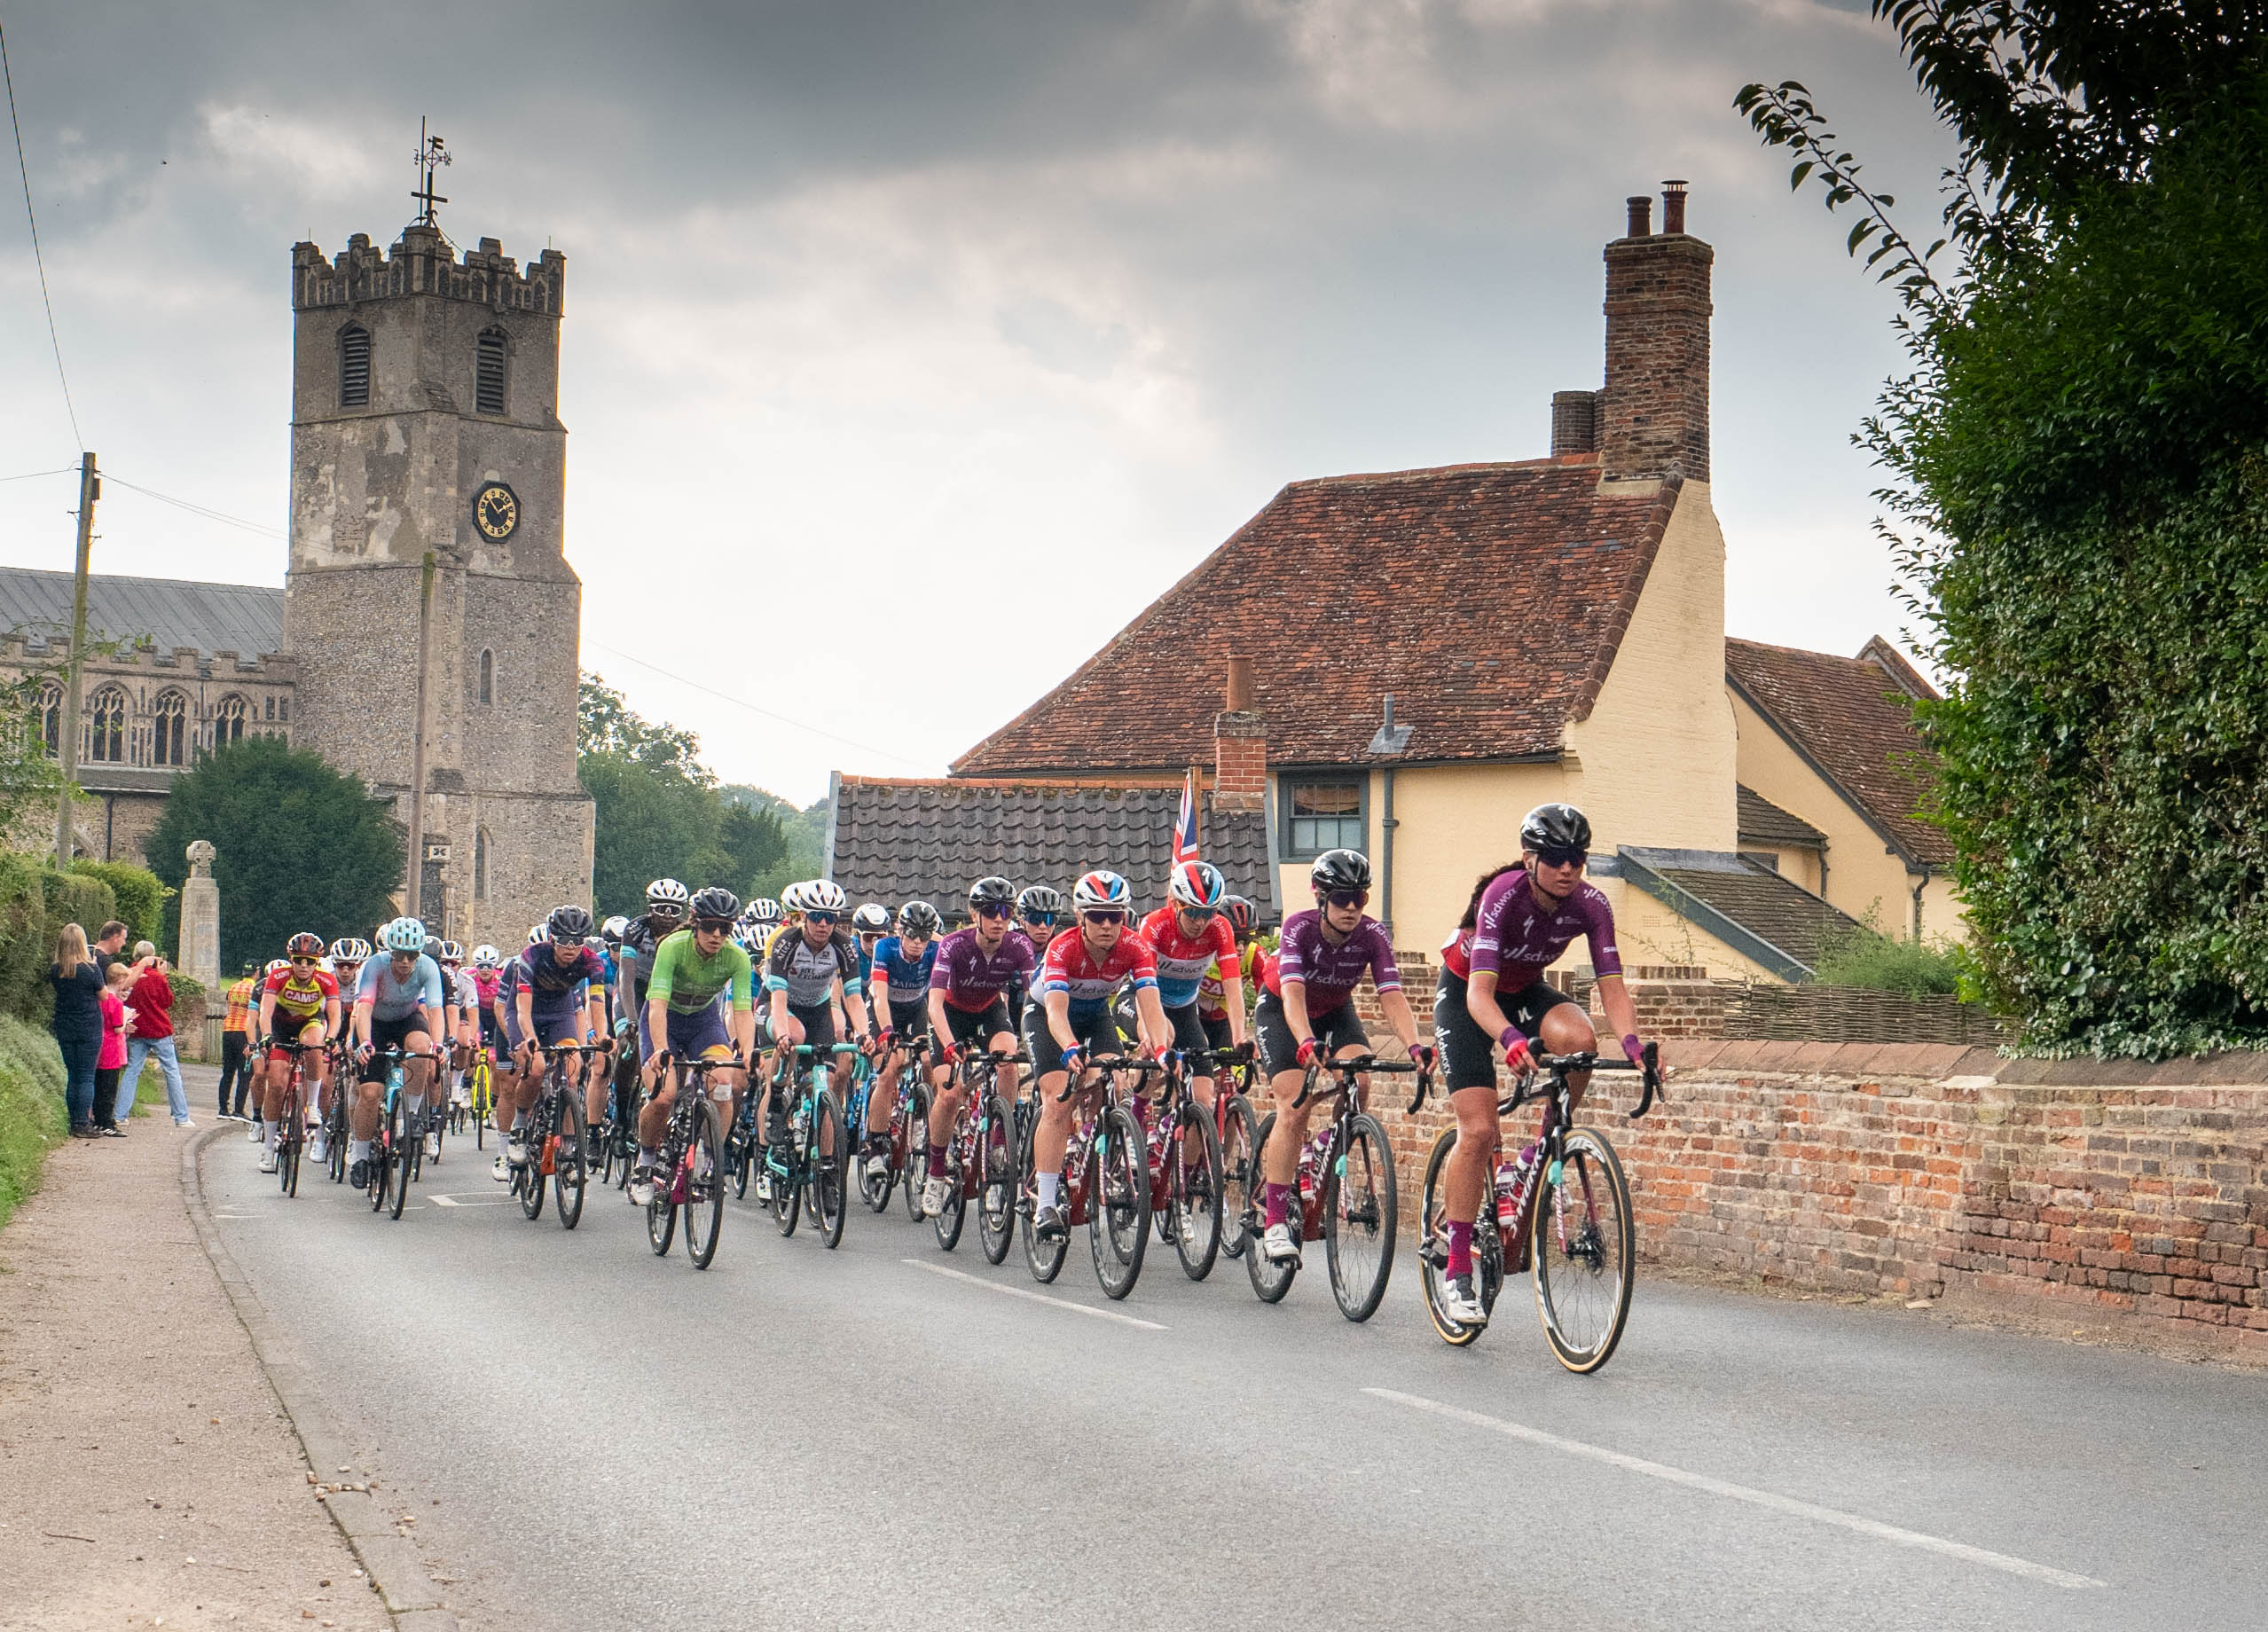 Cyclists in coddenham